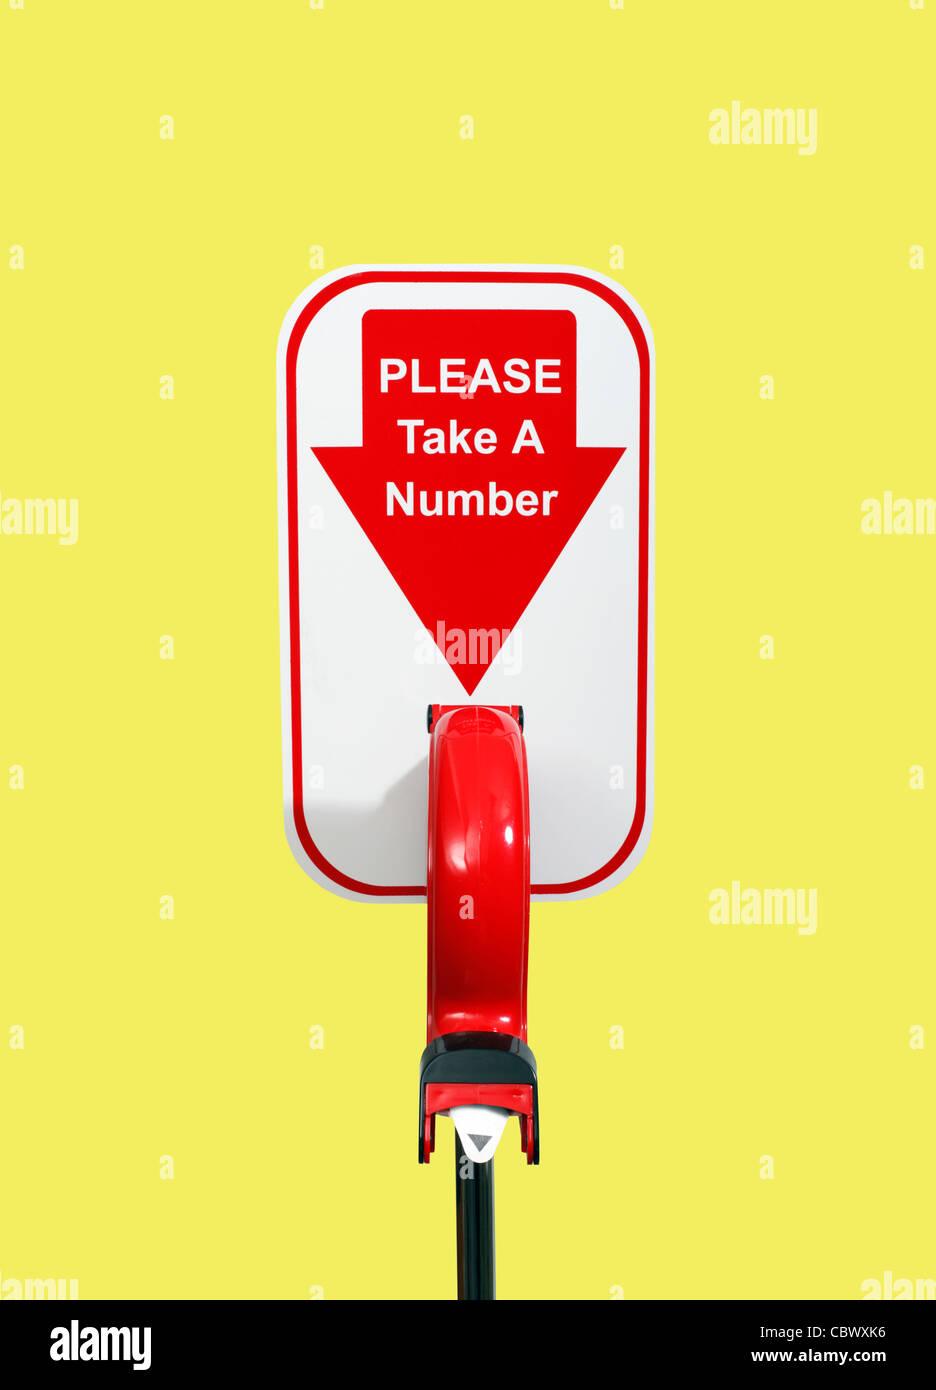 take a number machine